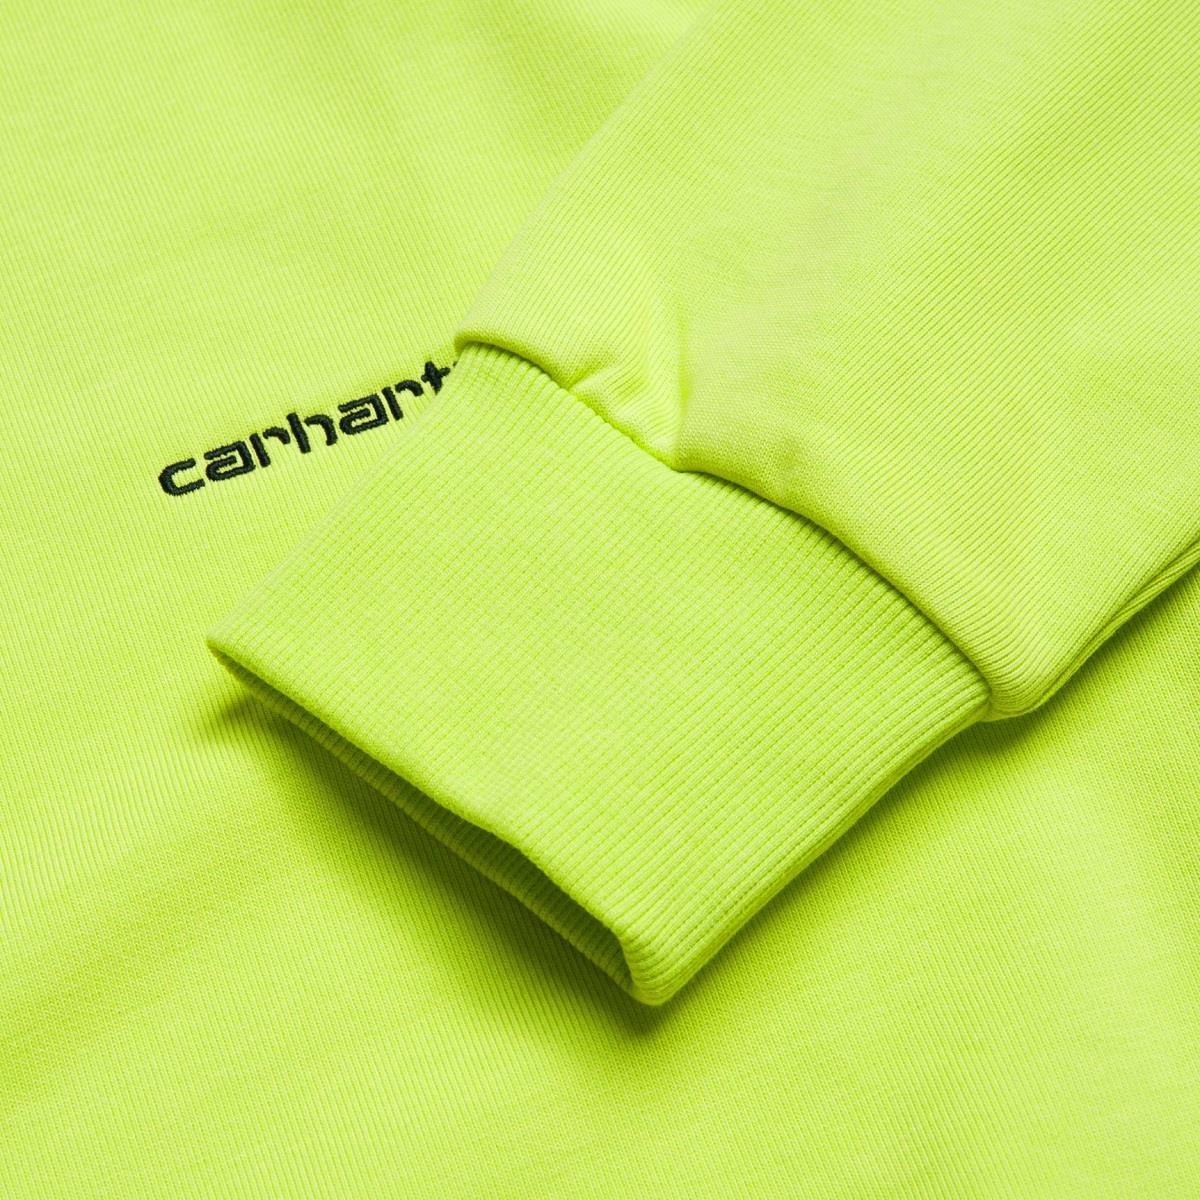 Carhartt Felpa Script Embroidery Sweatshirt